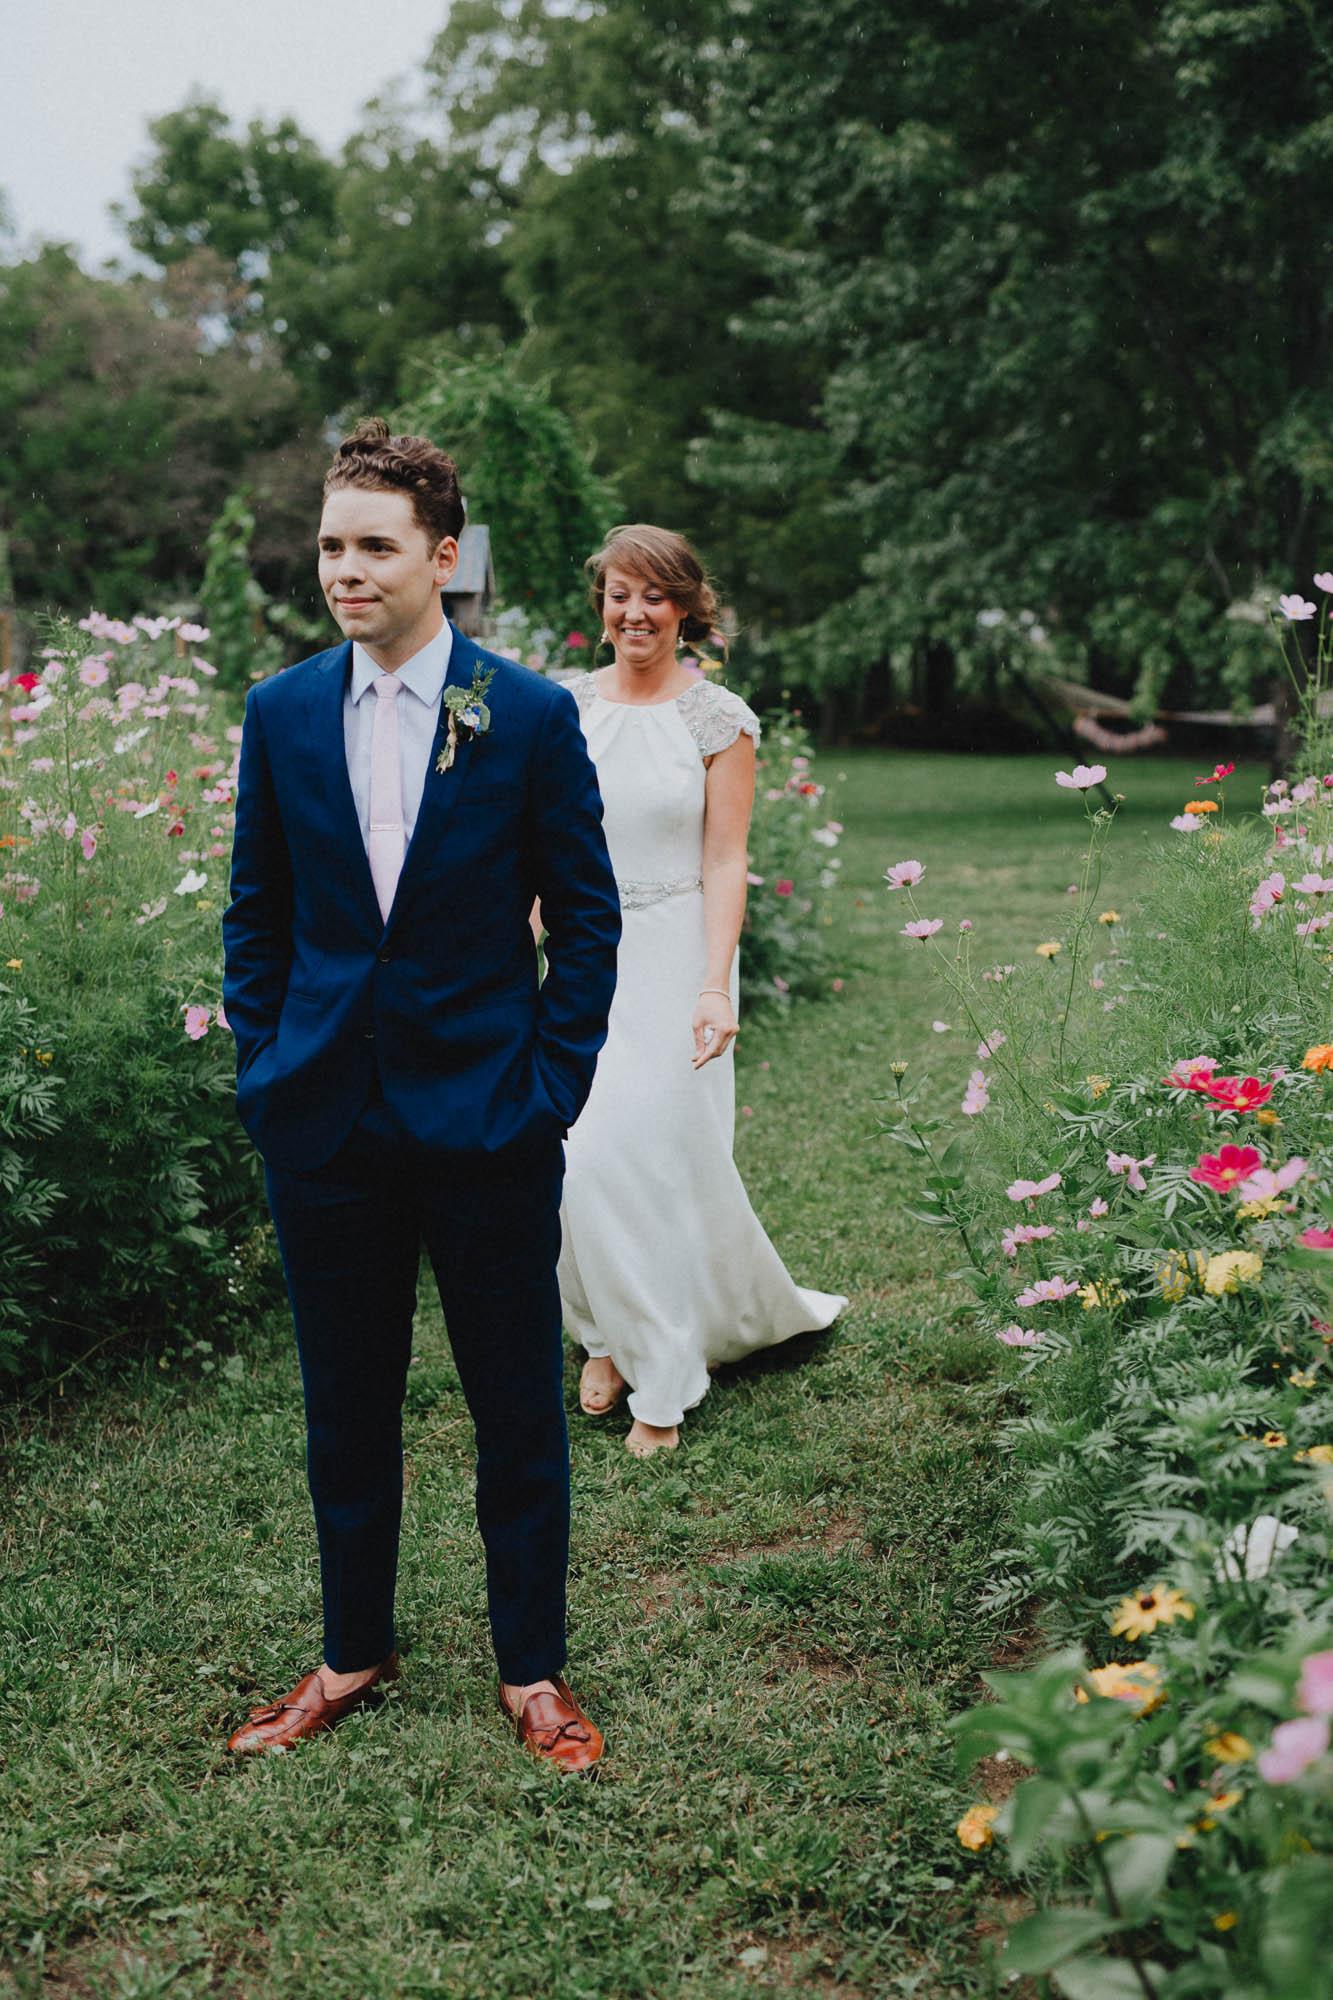 Leah-Graham-Michigan-Outdoor-DIY-Wedding-034@2x.jpg